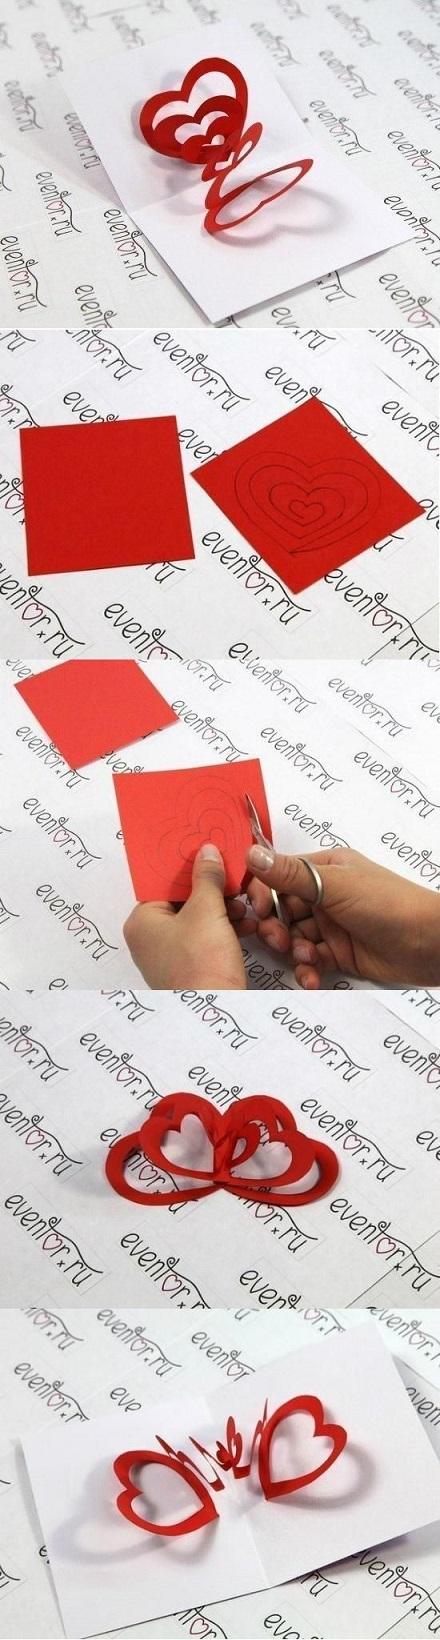 san valentin cards6